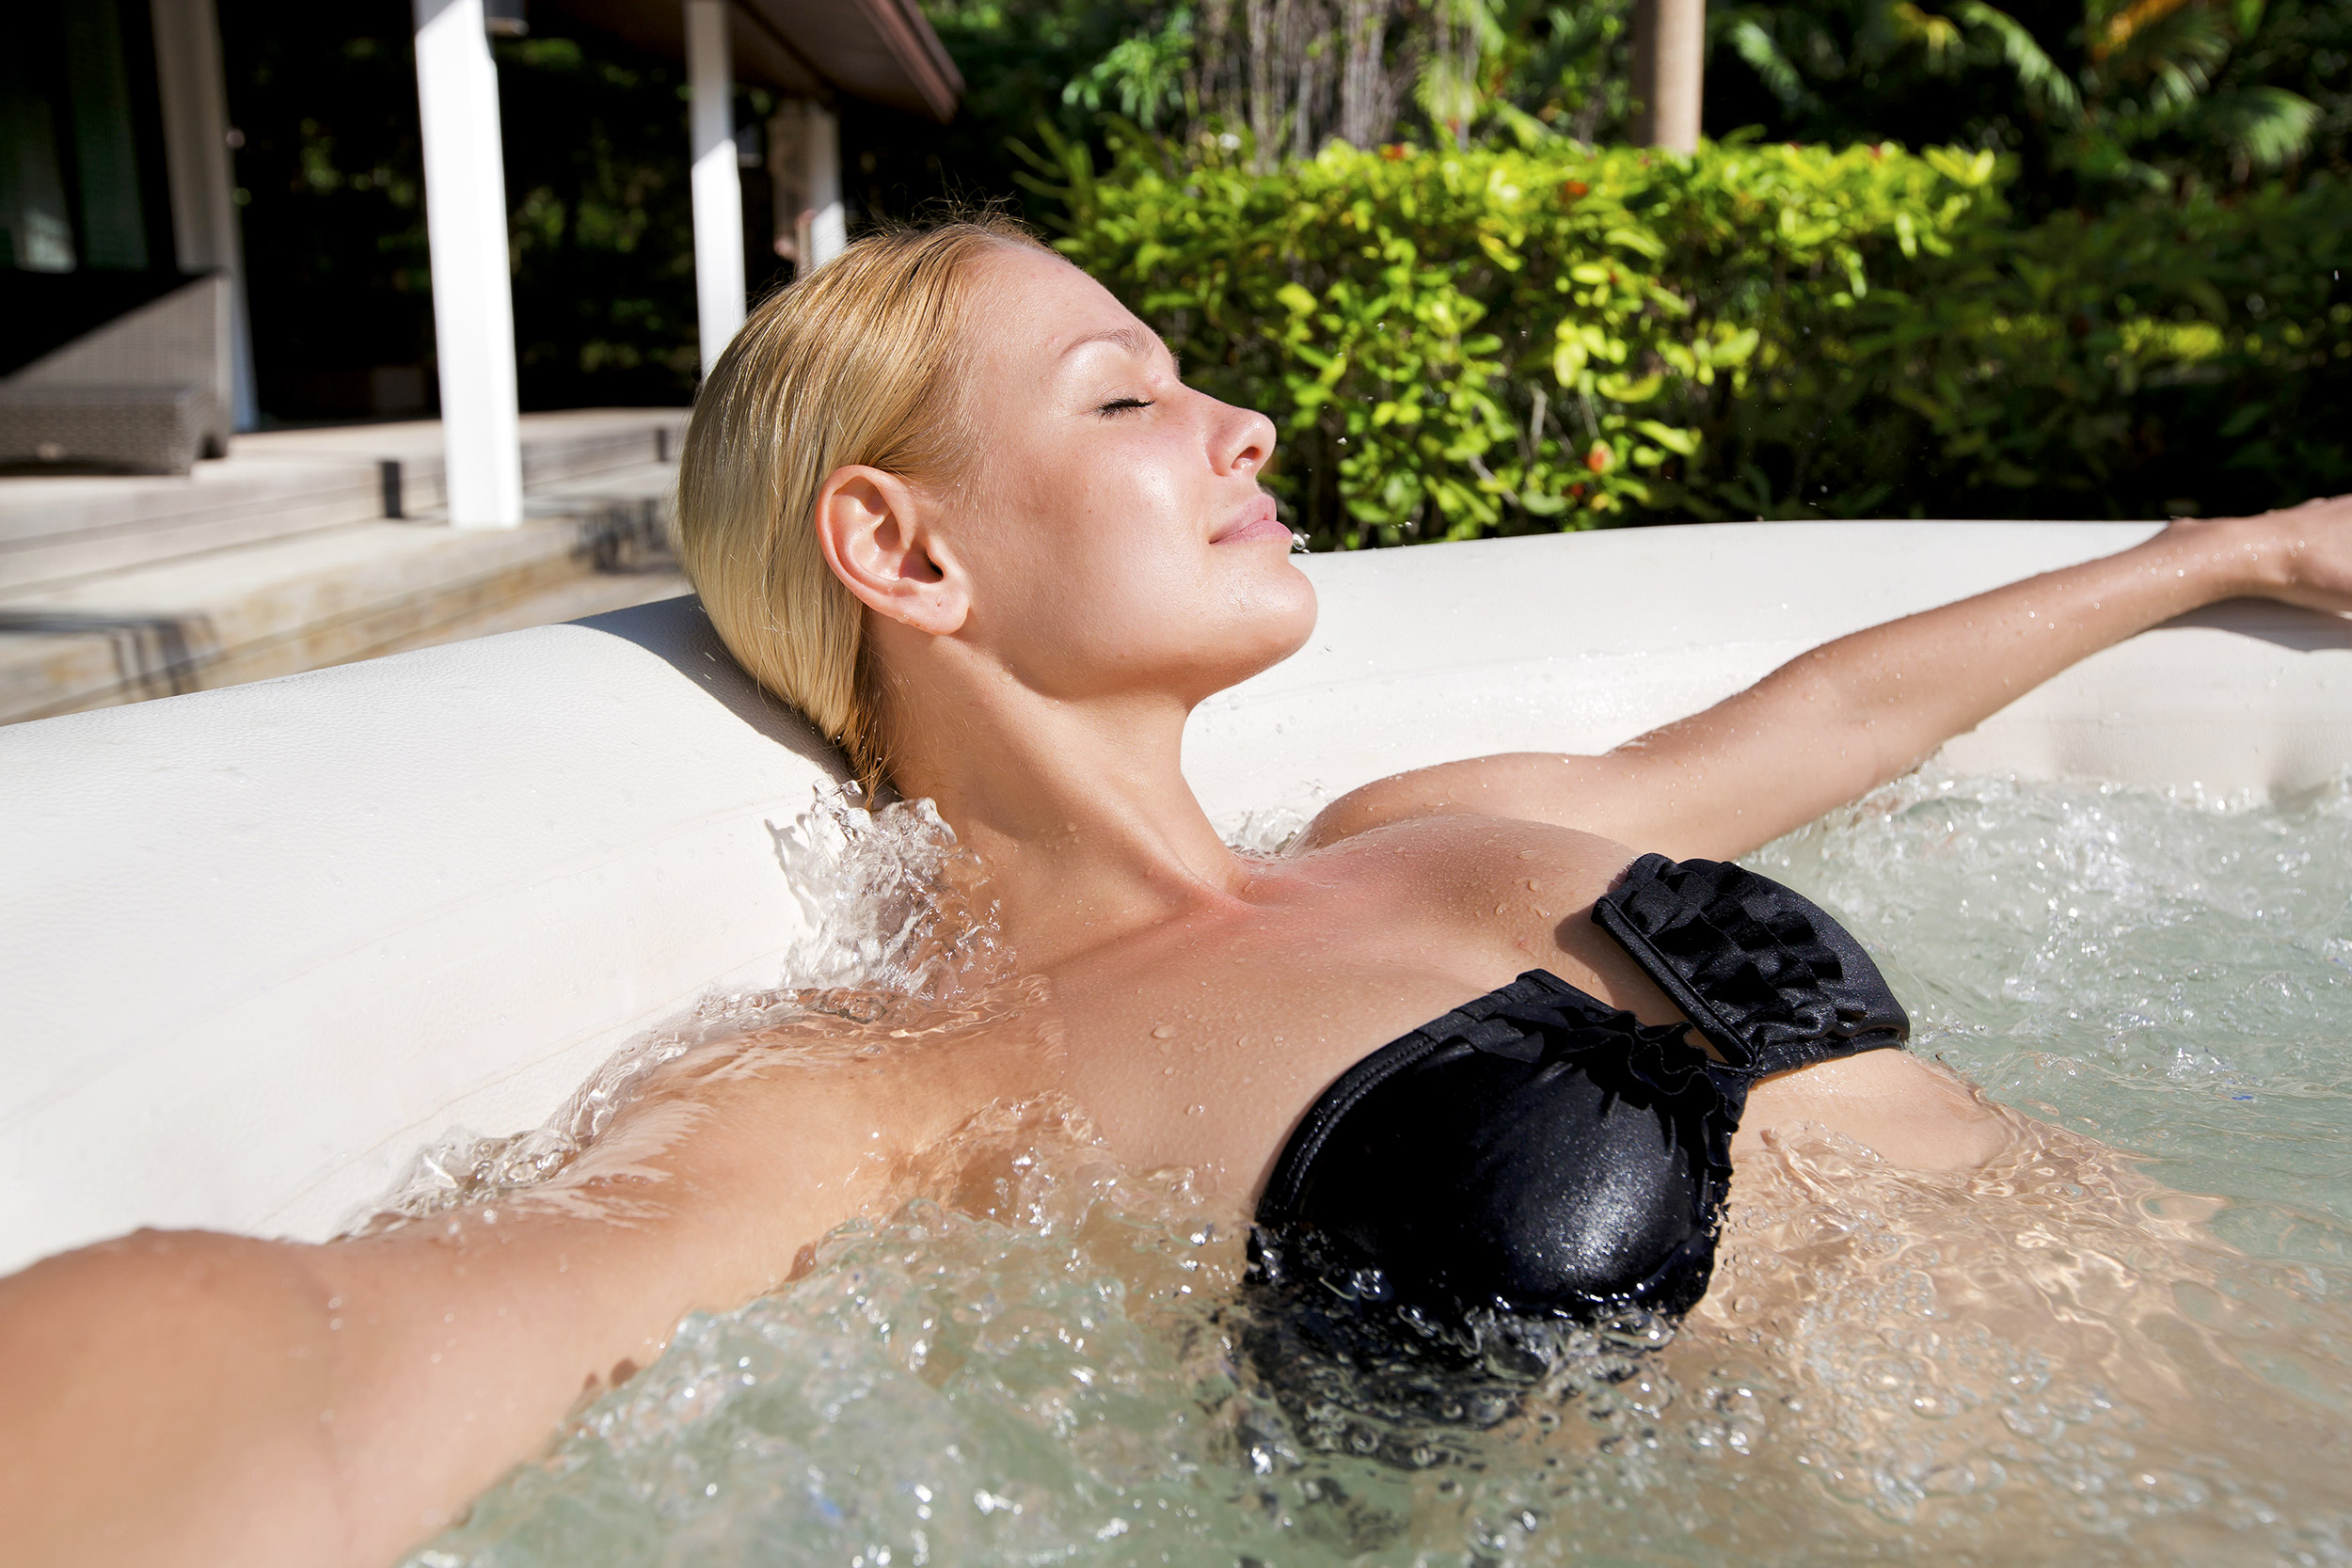 Junge Frau ruht sich im Whirlpool aus